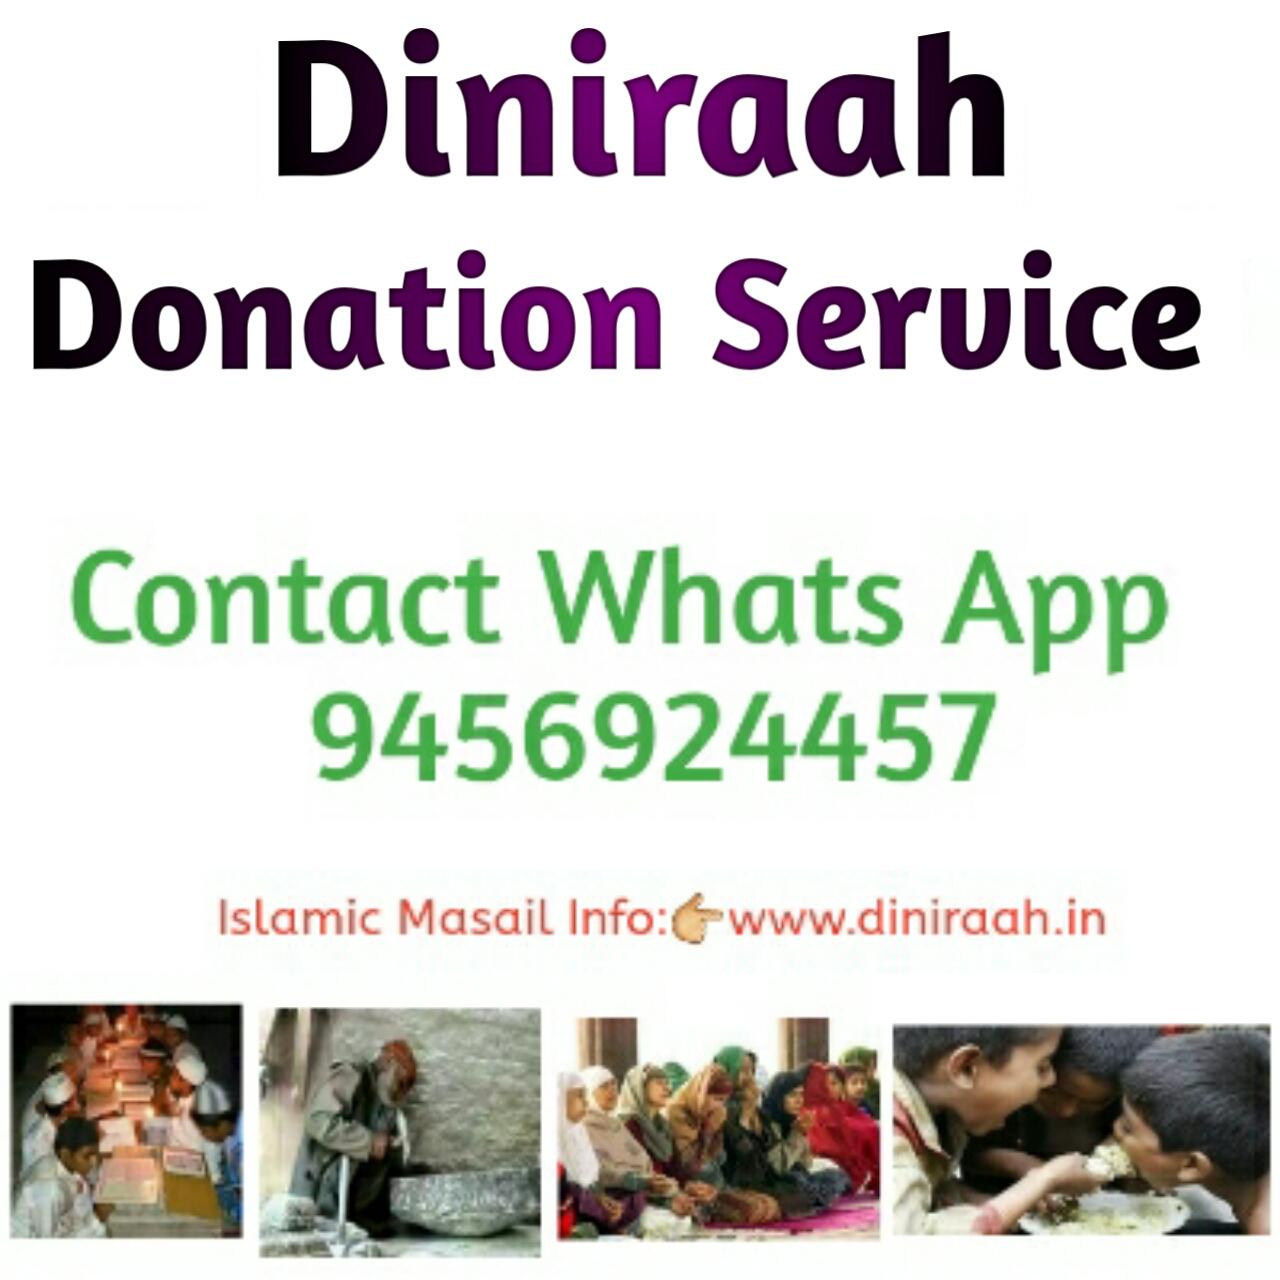 Diniraah Donation Service